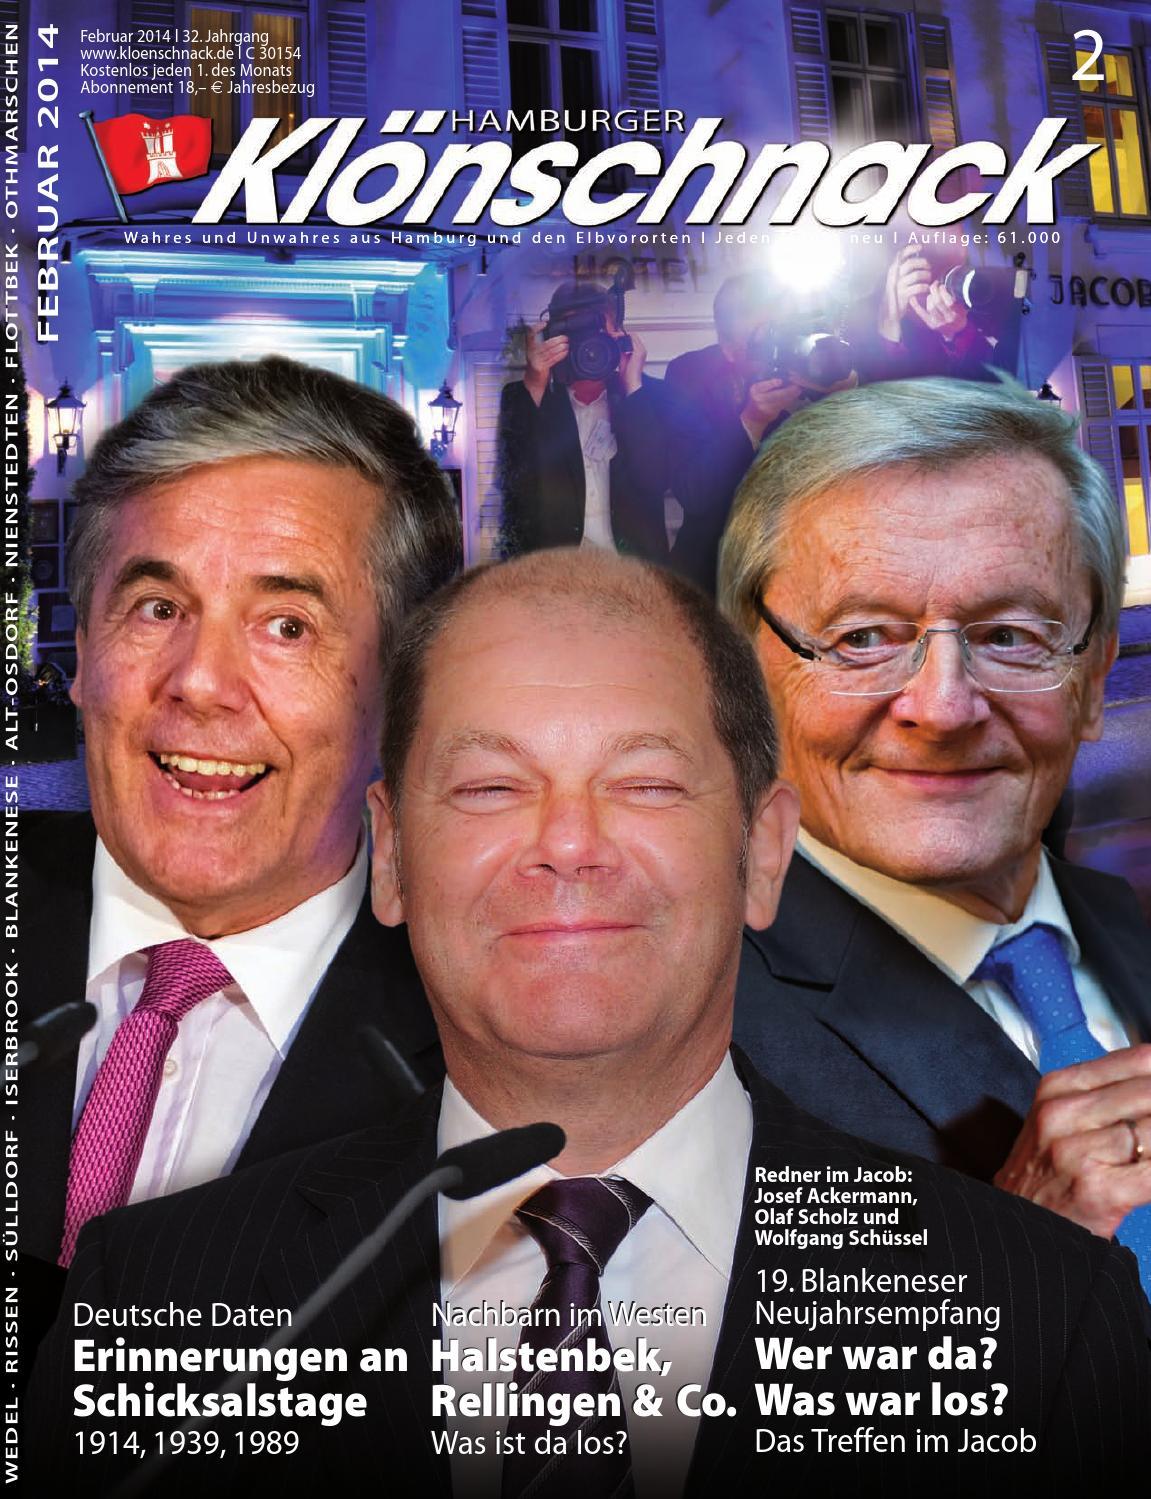 Kloenschnack Februar 2014 by Hamburger Klönschnack issuu